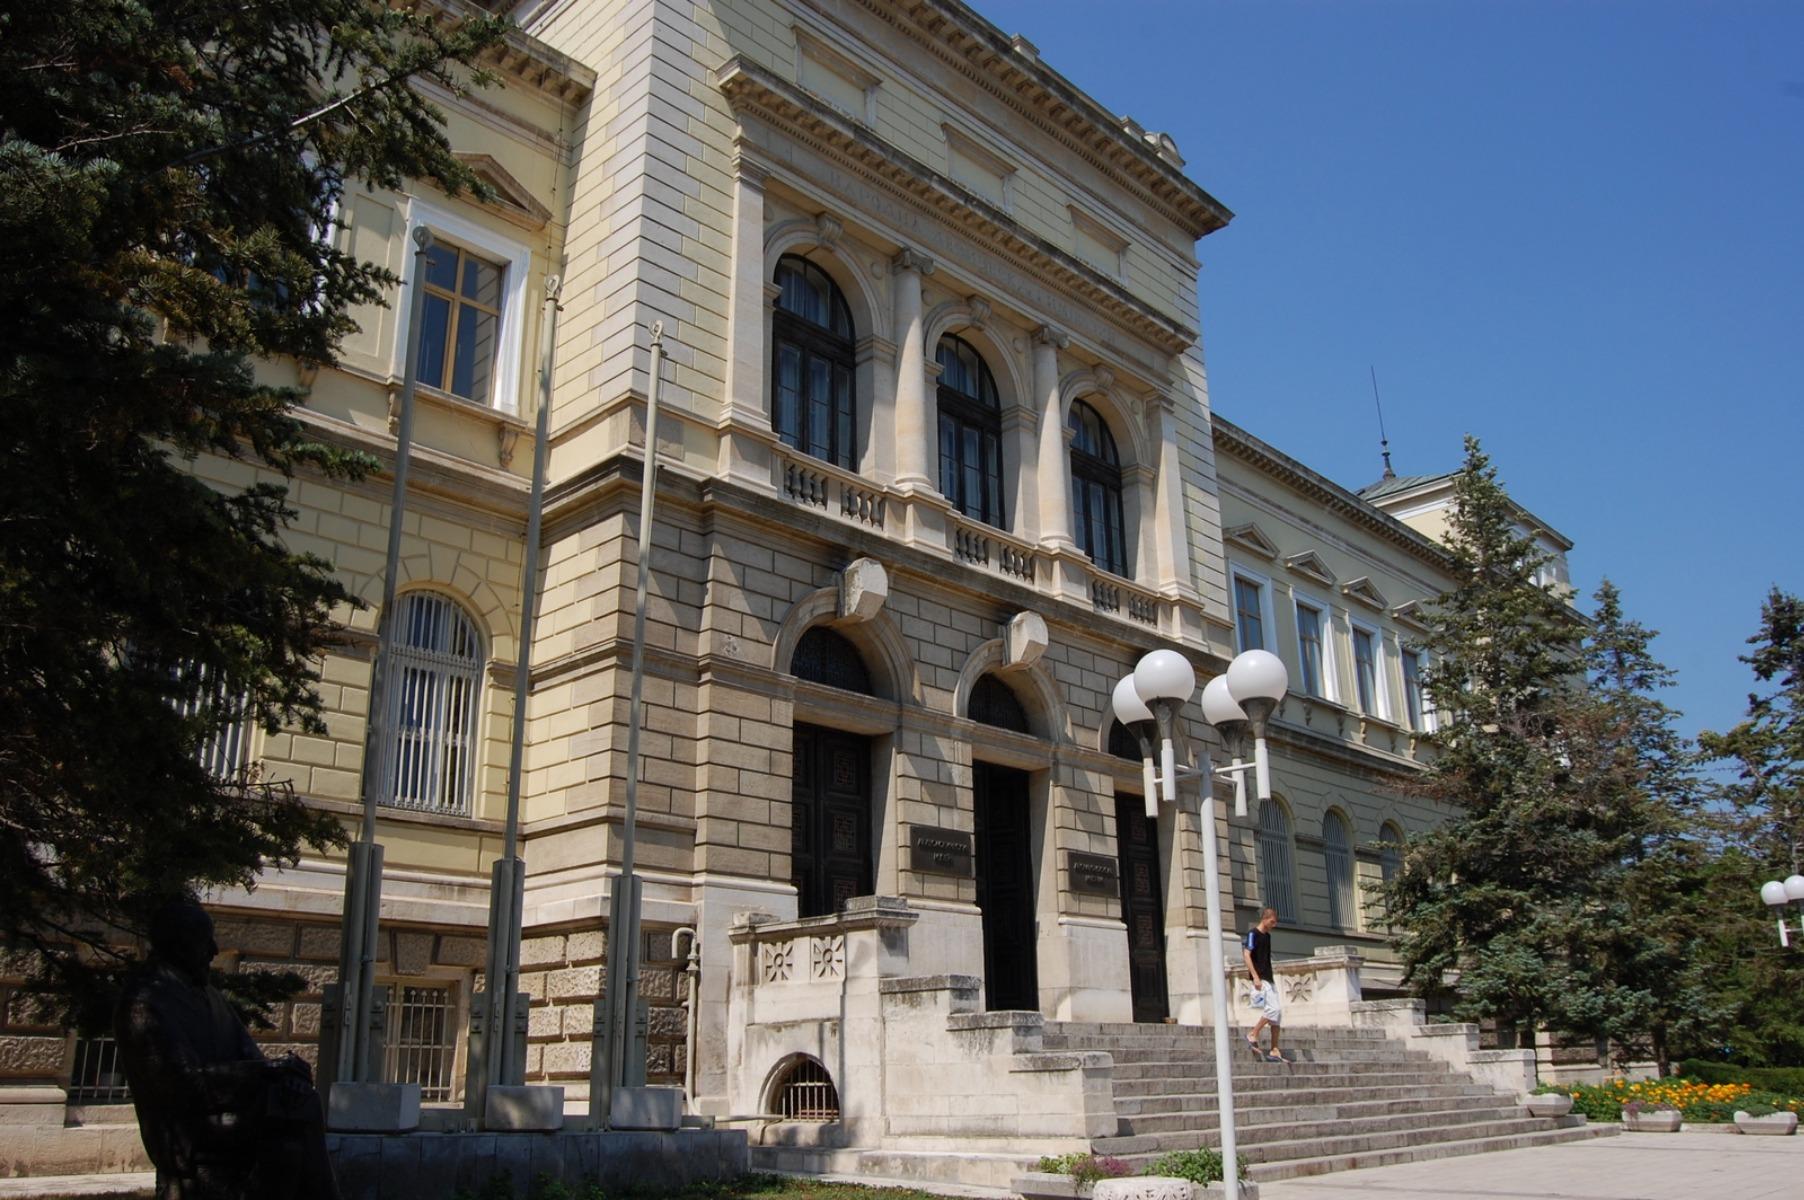 bulgaria27-1609772978.jpg